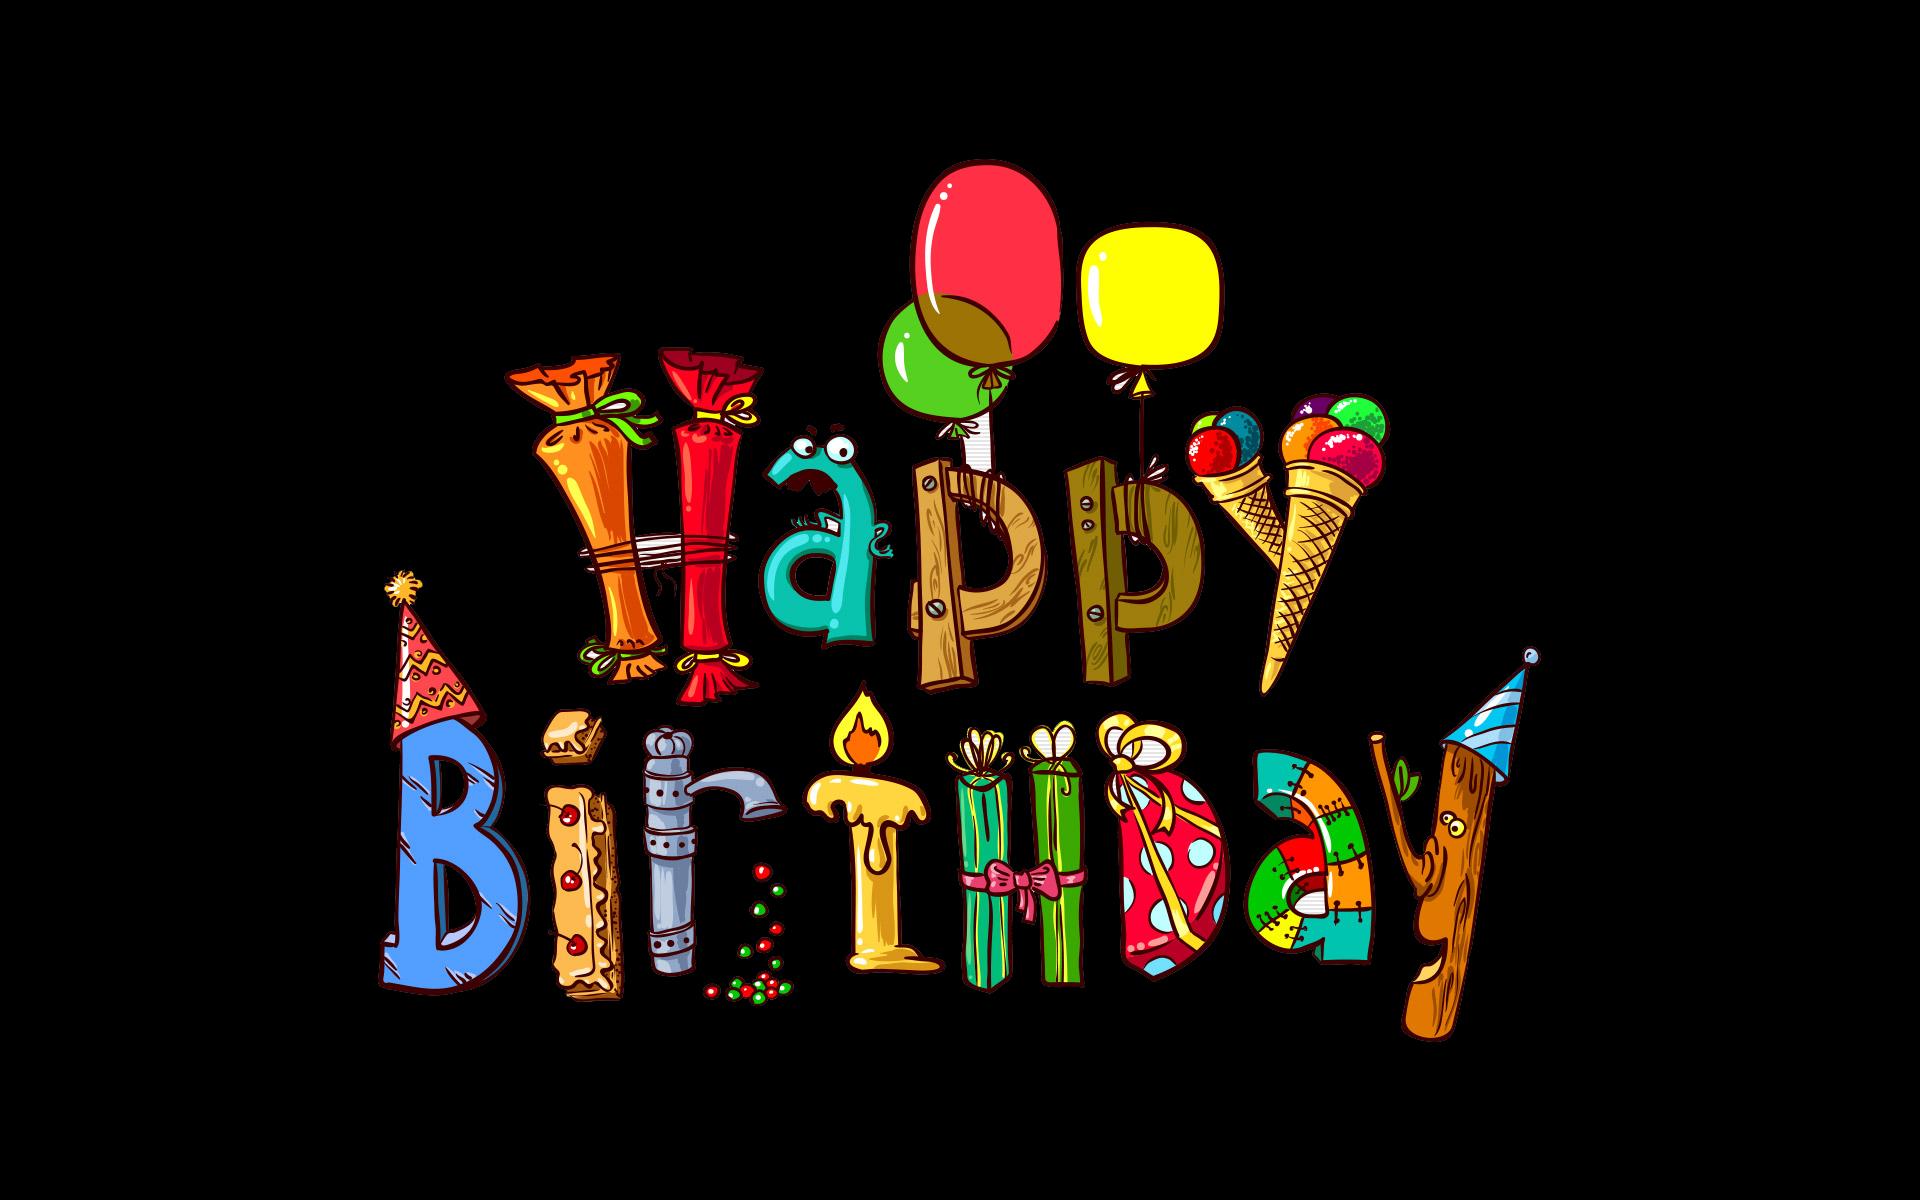 free happy birthday wallpaper 26587 1920x1200 px